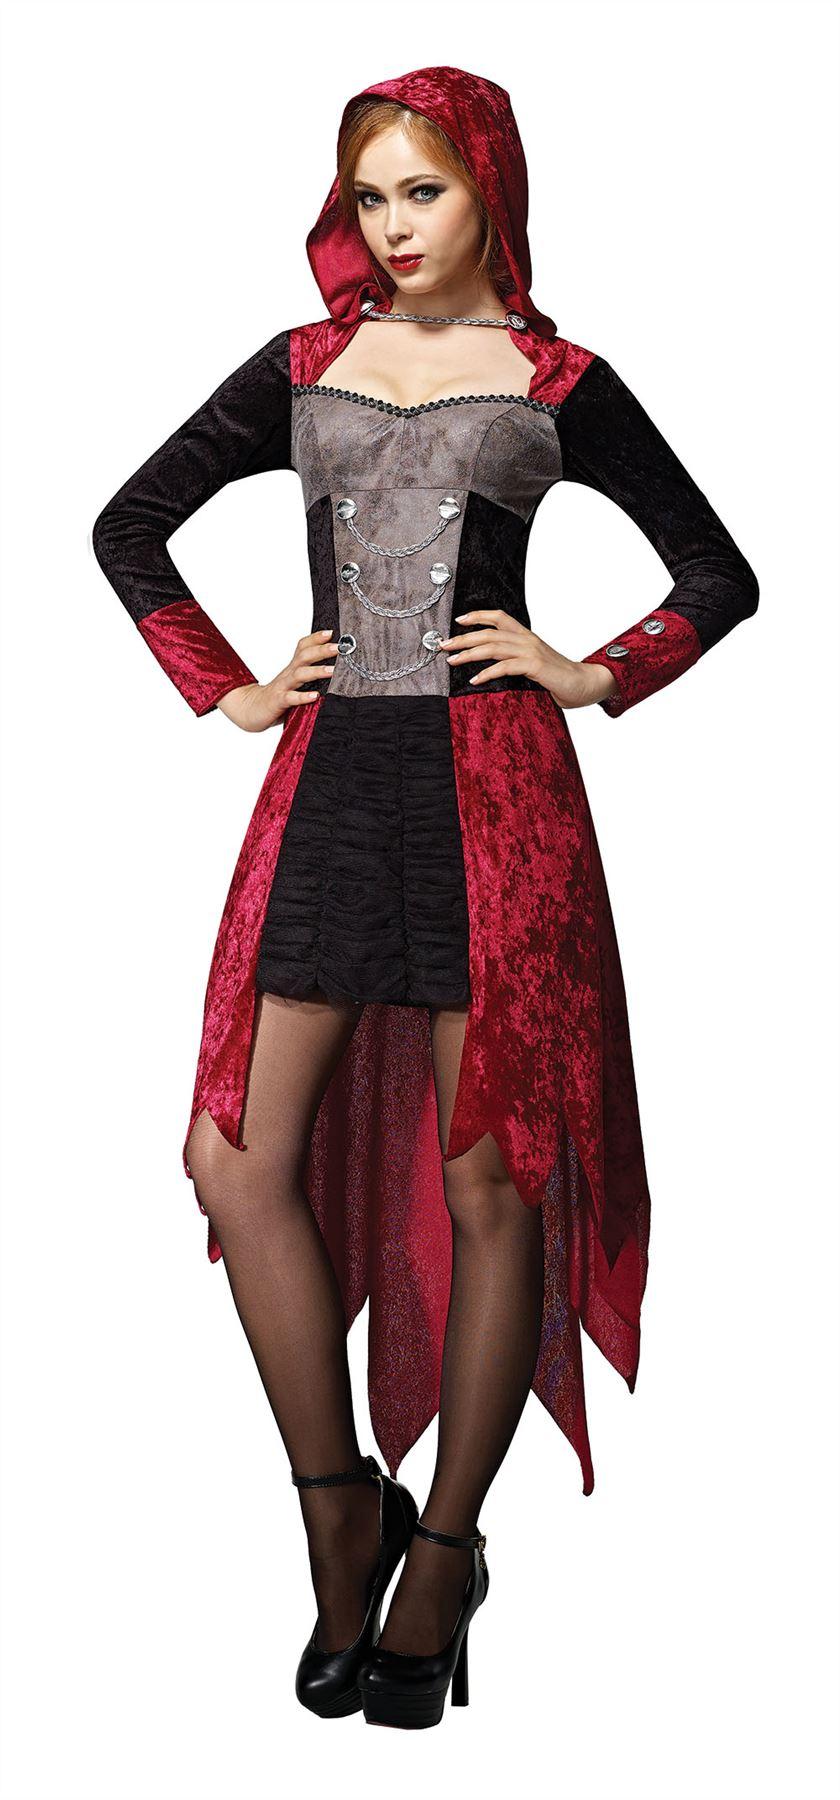 dämon maiden, teufel, frauen halloween-kostüme #de | ebay